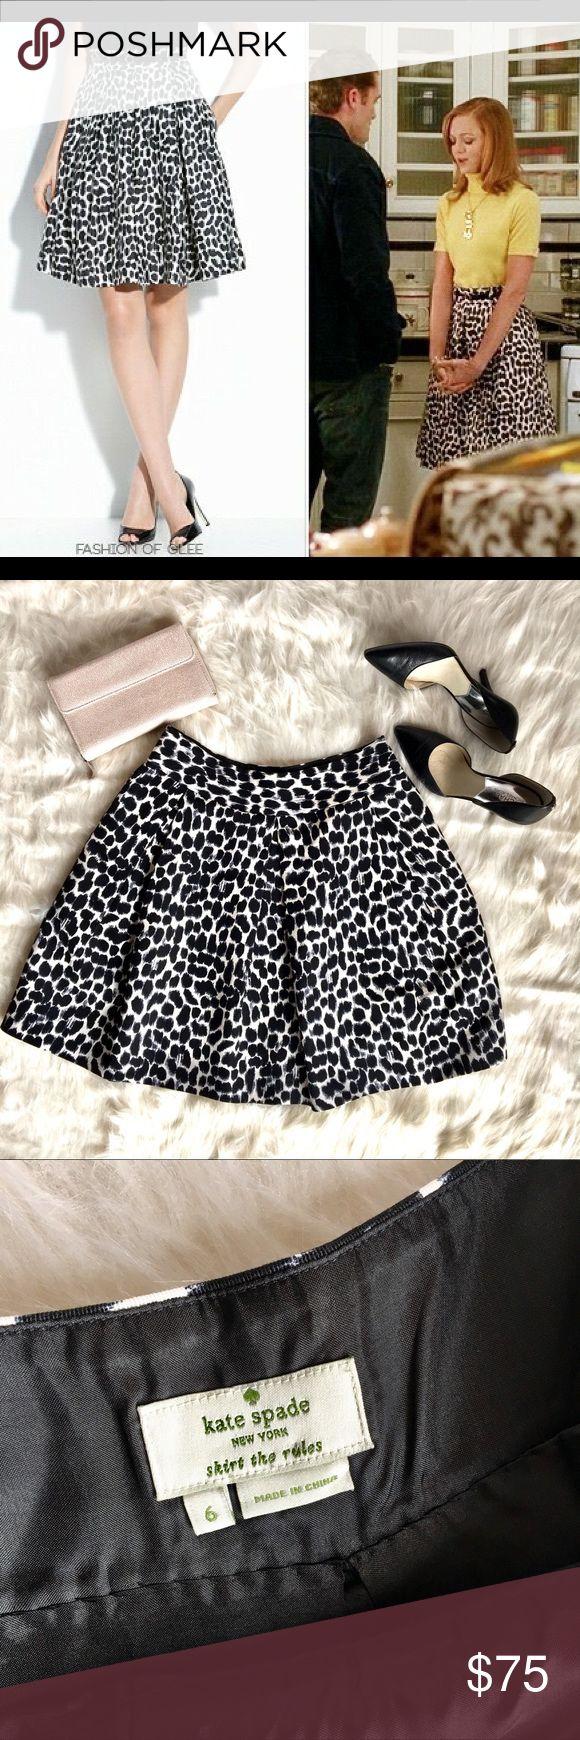 Kate Spade 6 Coreen leopard animal print skirt